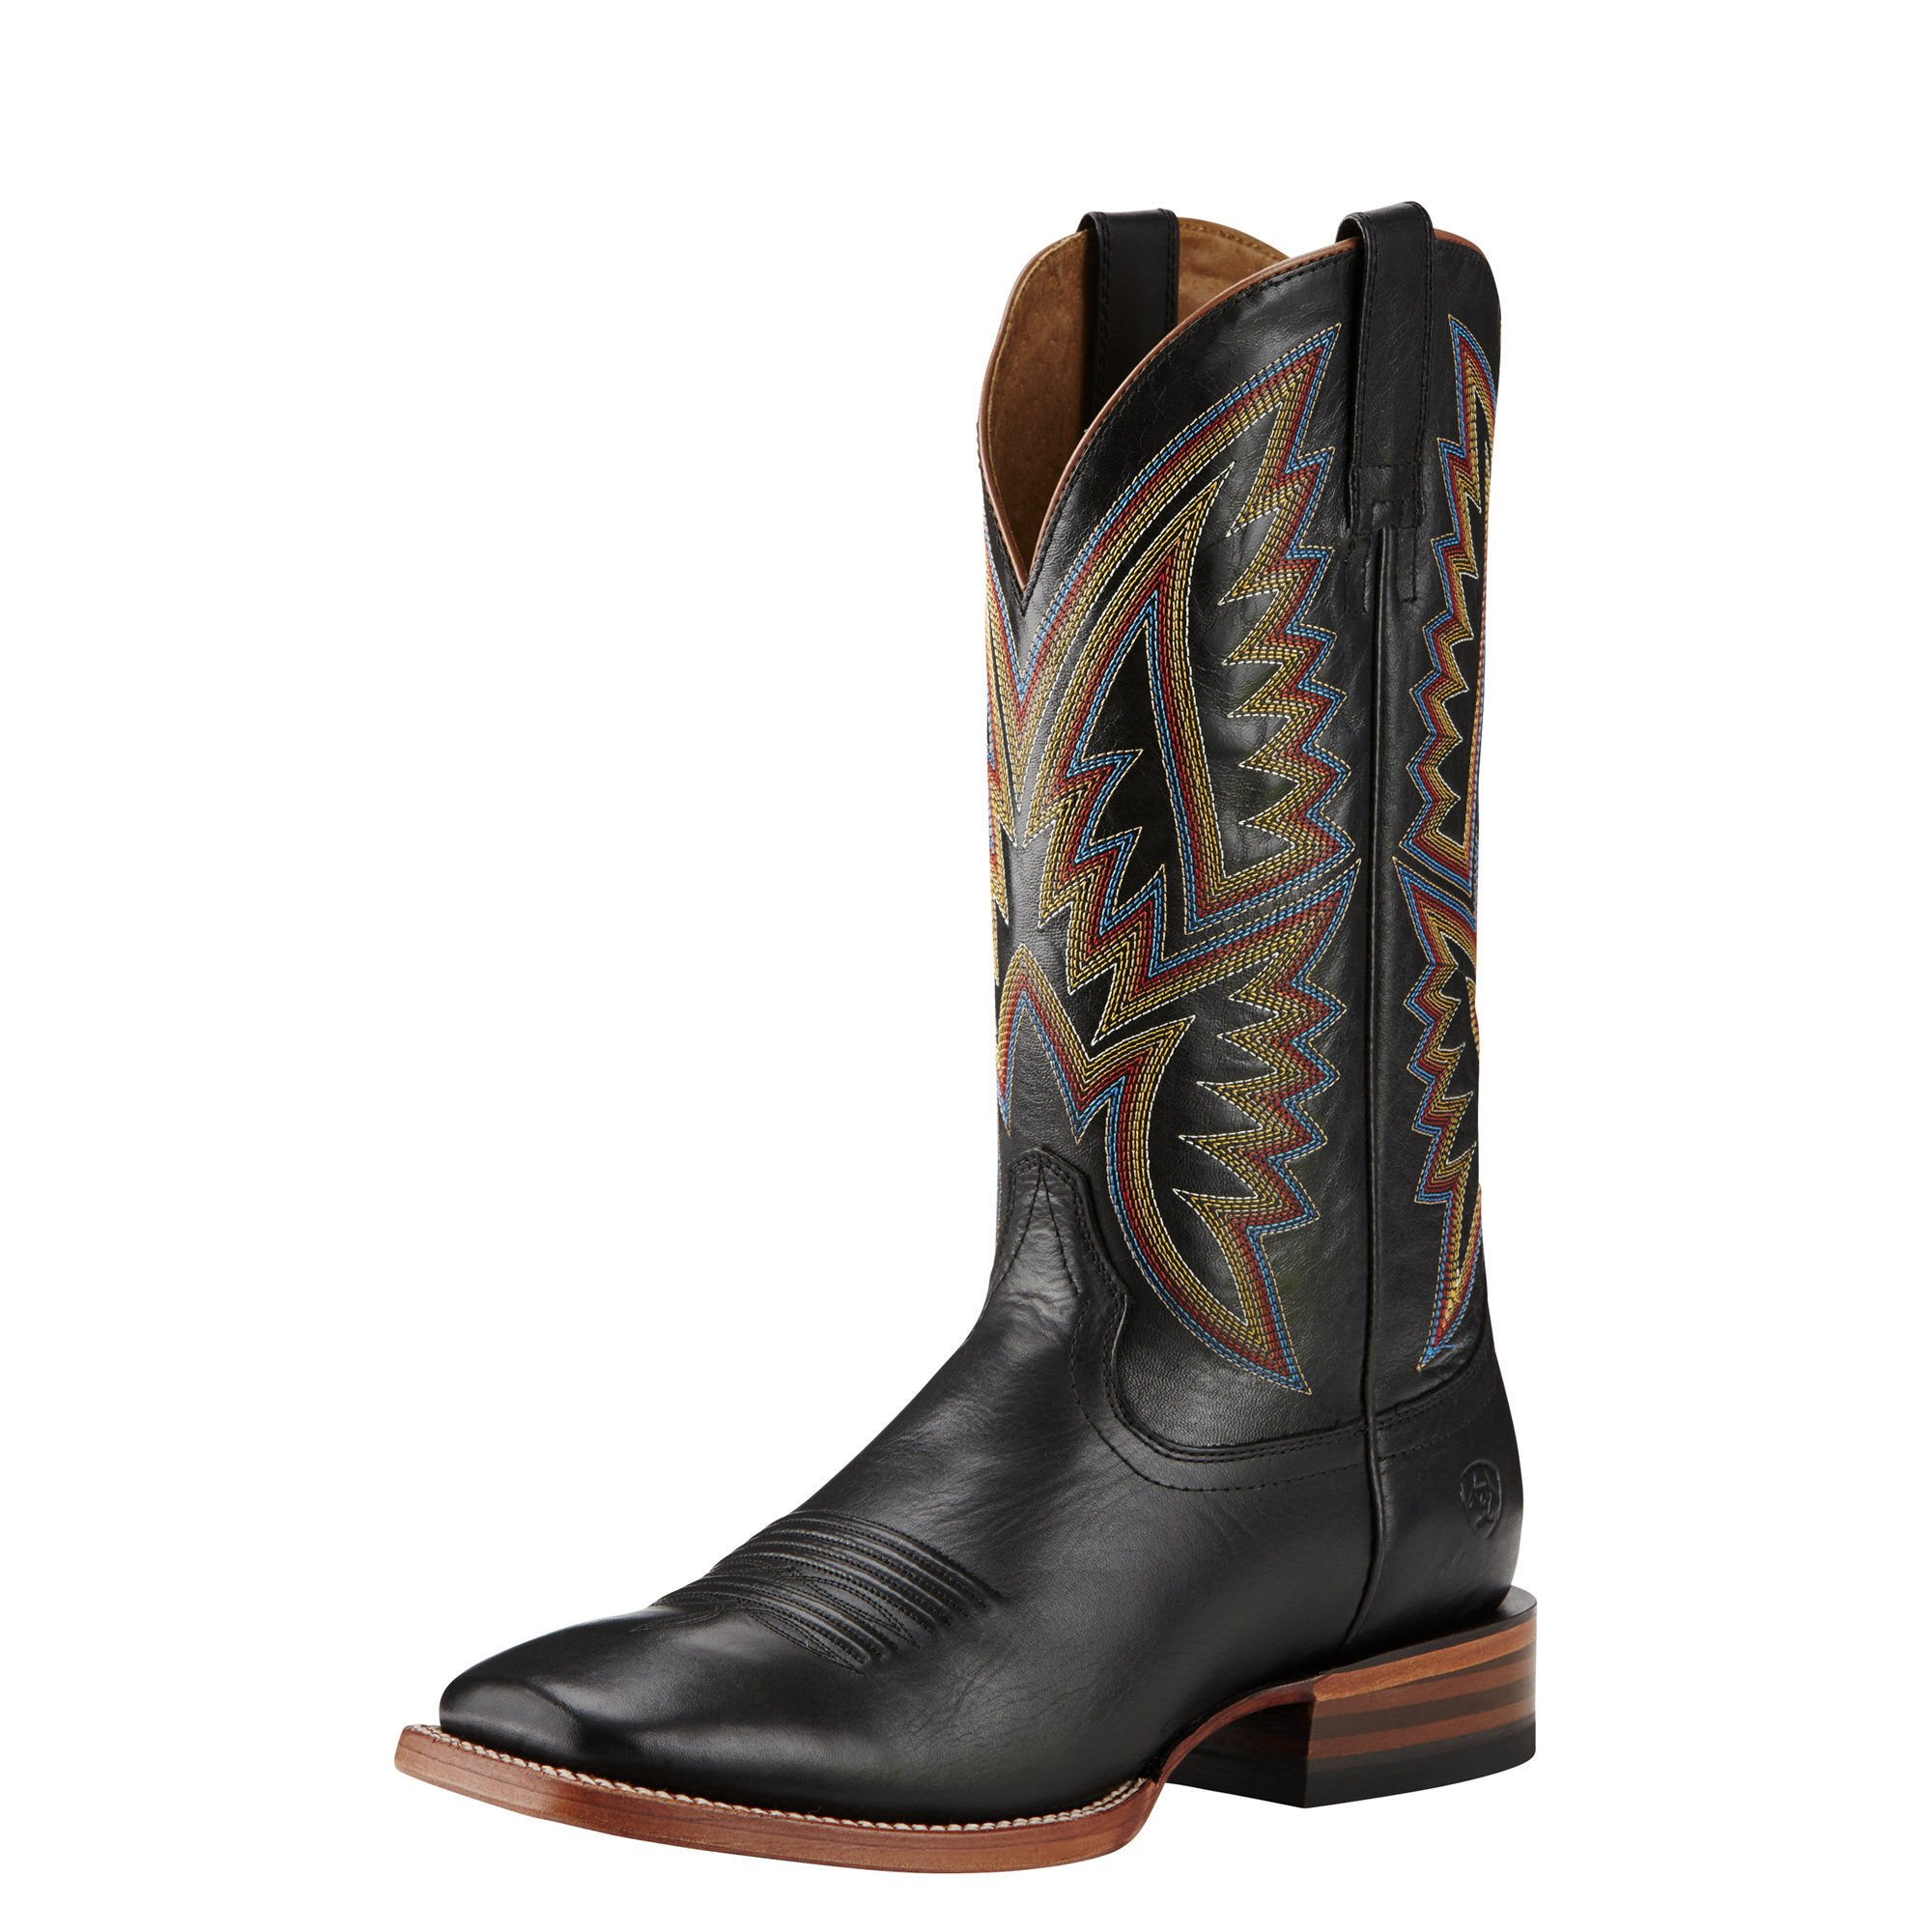 Ariat Men's Hesston Western Cowboy Boot, Midnight Black/Black, 8 D US